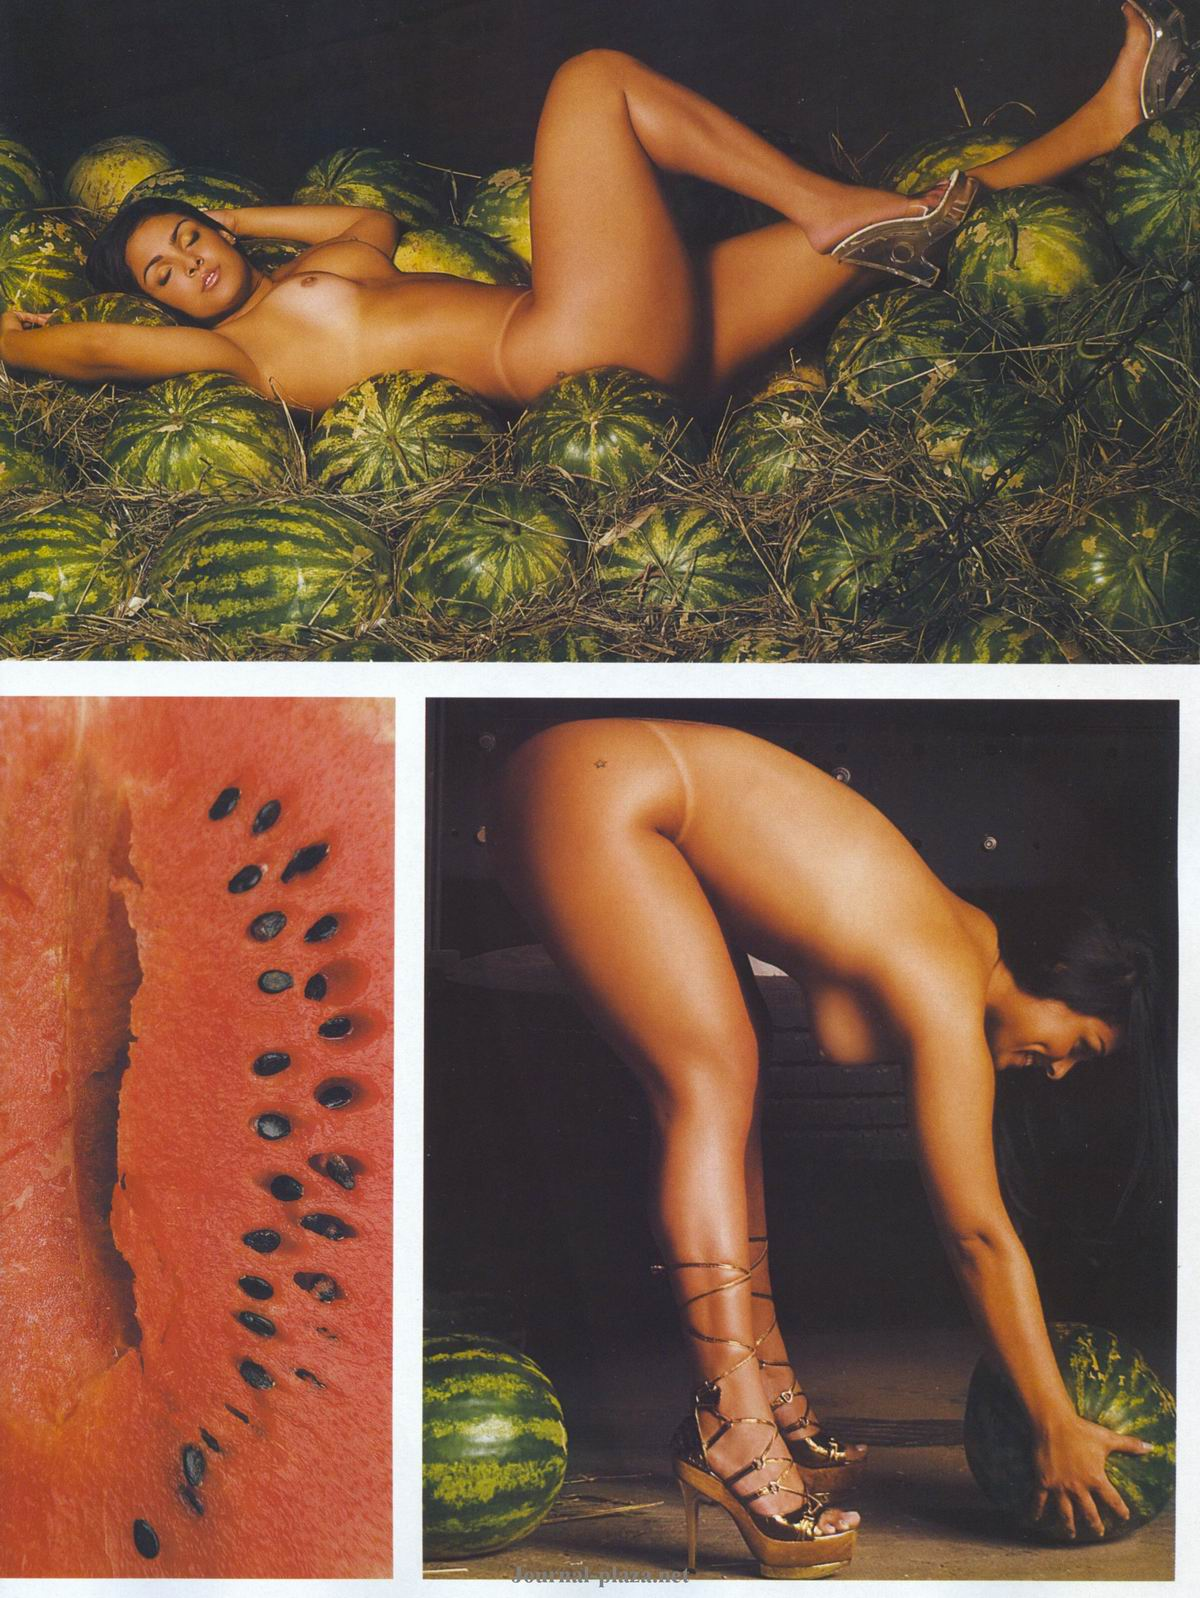 85863_Playboy_2008_10_-_89_122_1165lo.jpg